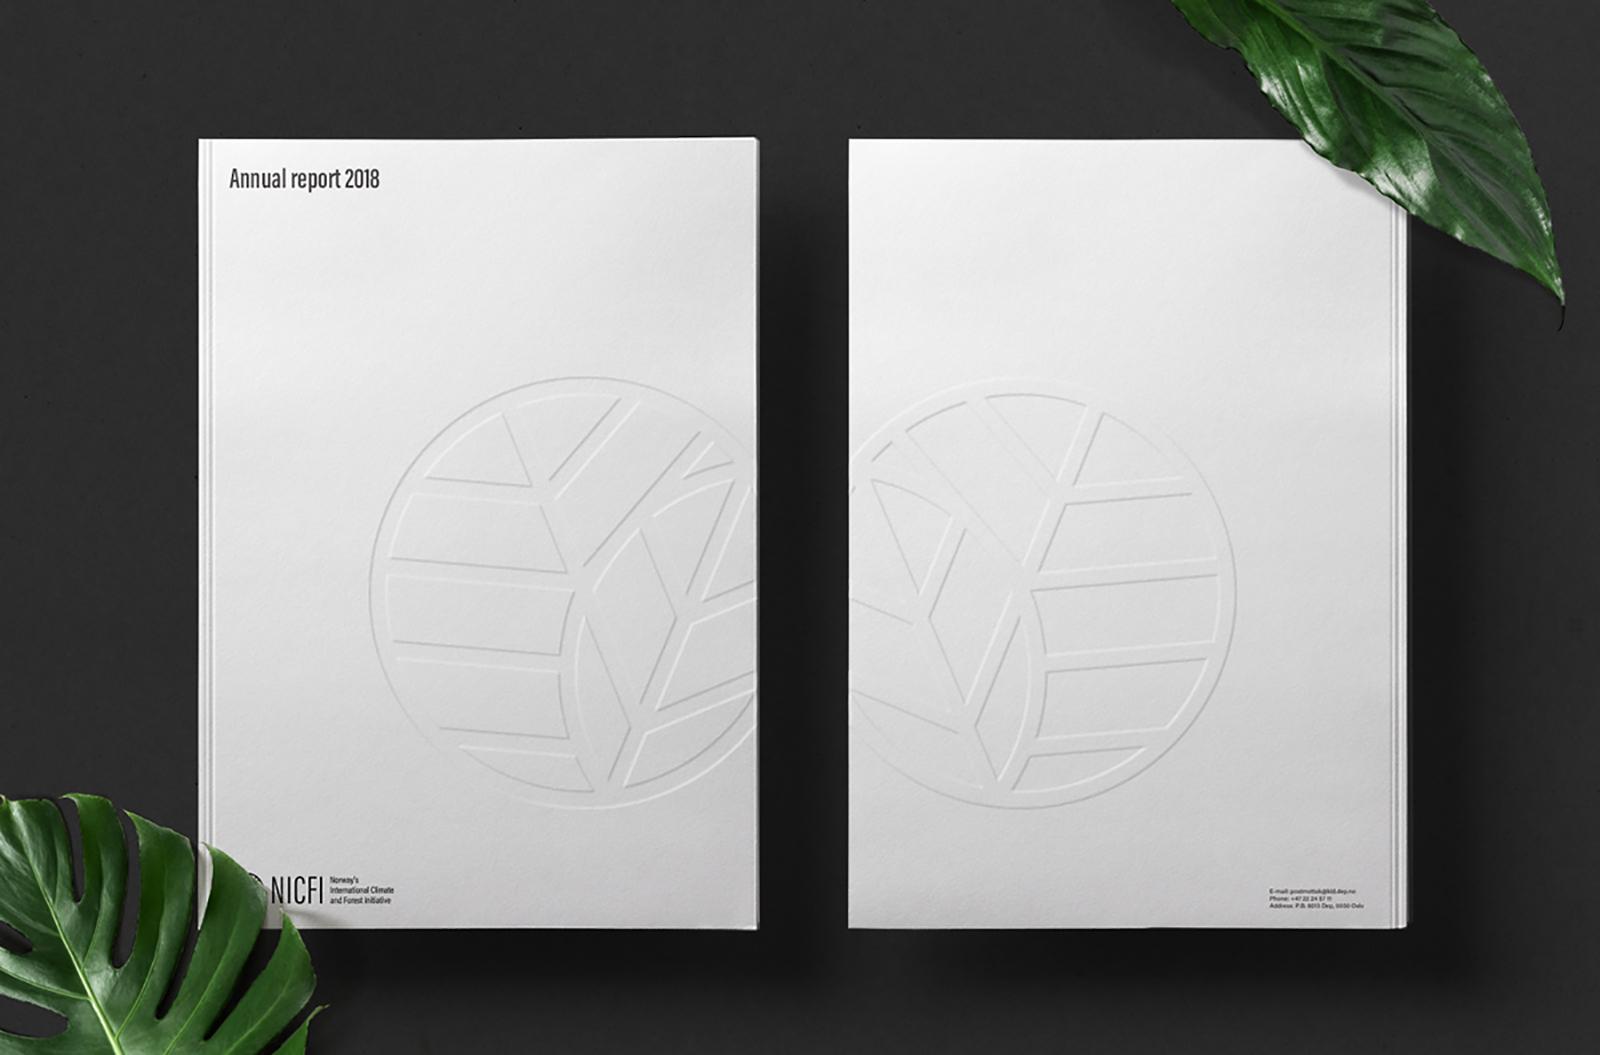 NICFI品牌视觉VI形象设计欣赏-深圳VI设计5